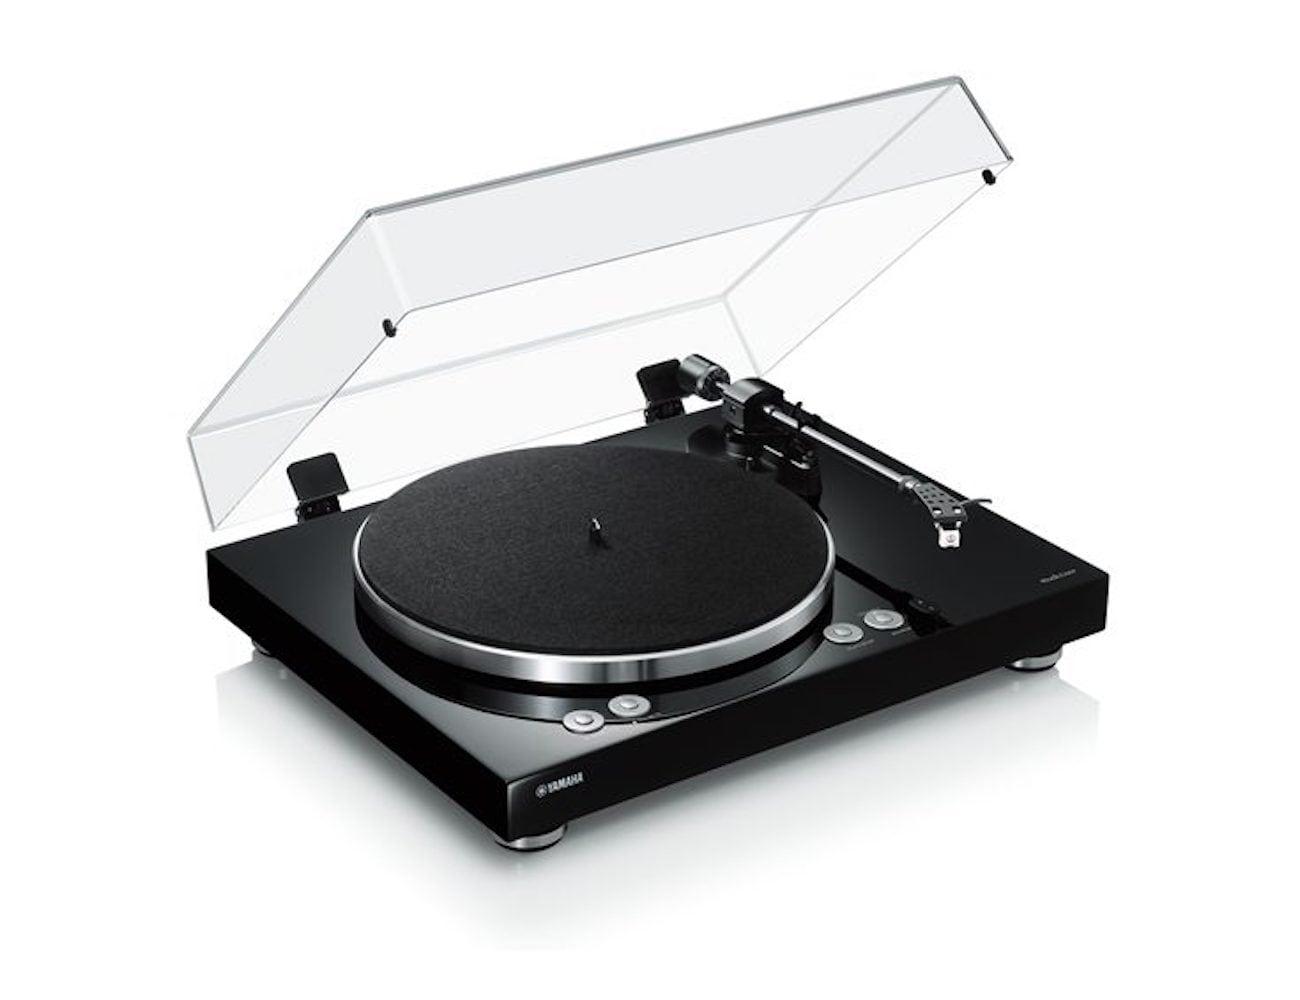 yamaha musiccast vinyl 500 wi fi turntable gadget flow